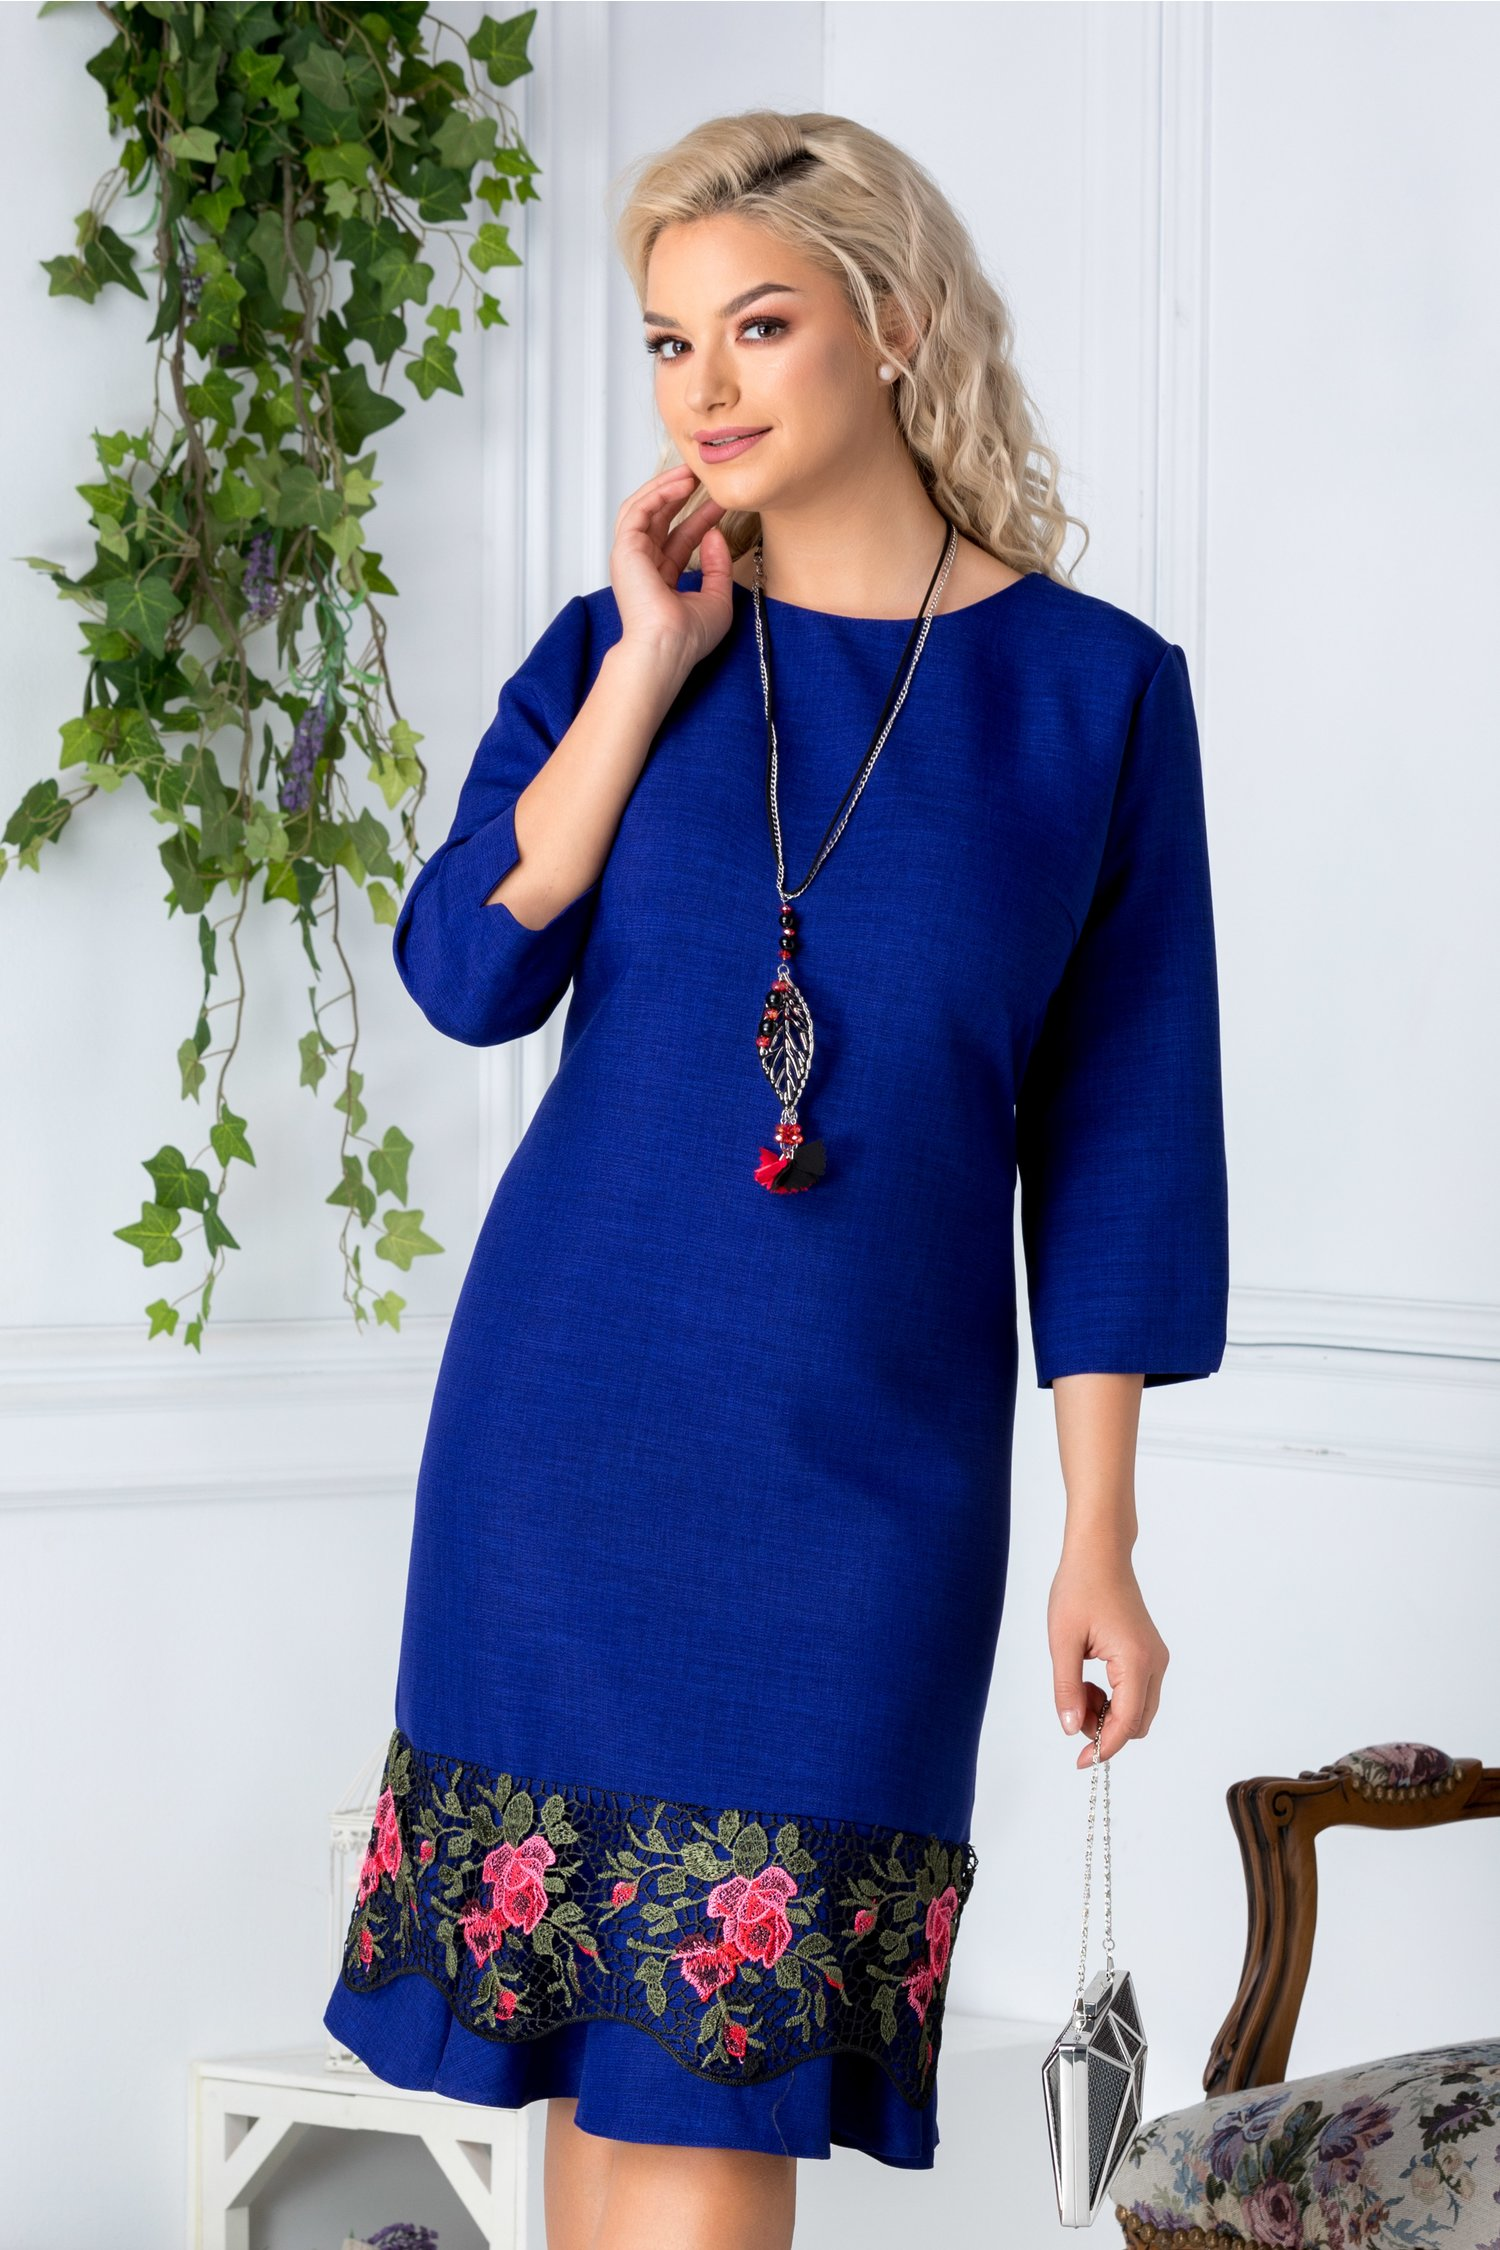 Rochie Saly albastru indigo cu dantela brodata floral